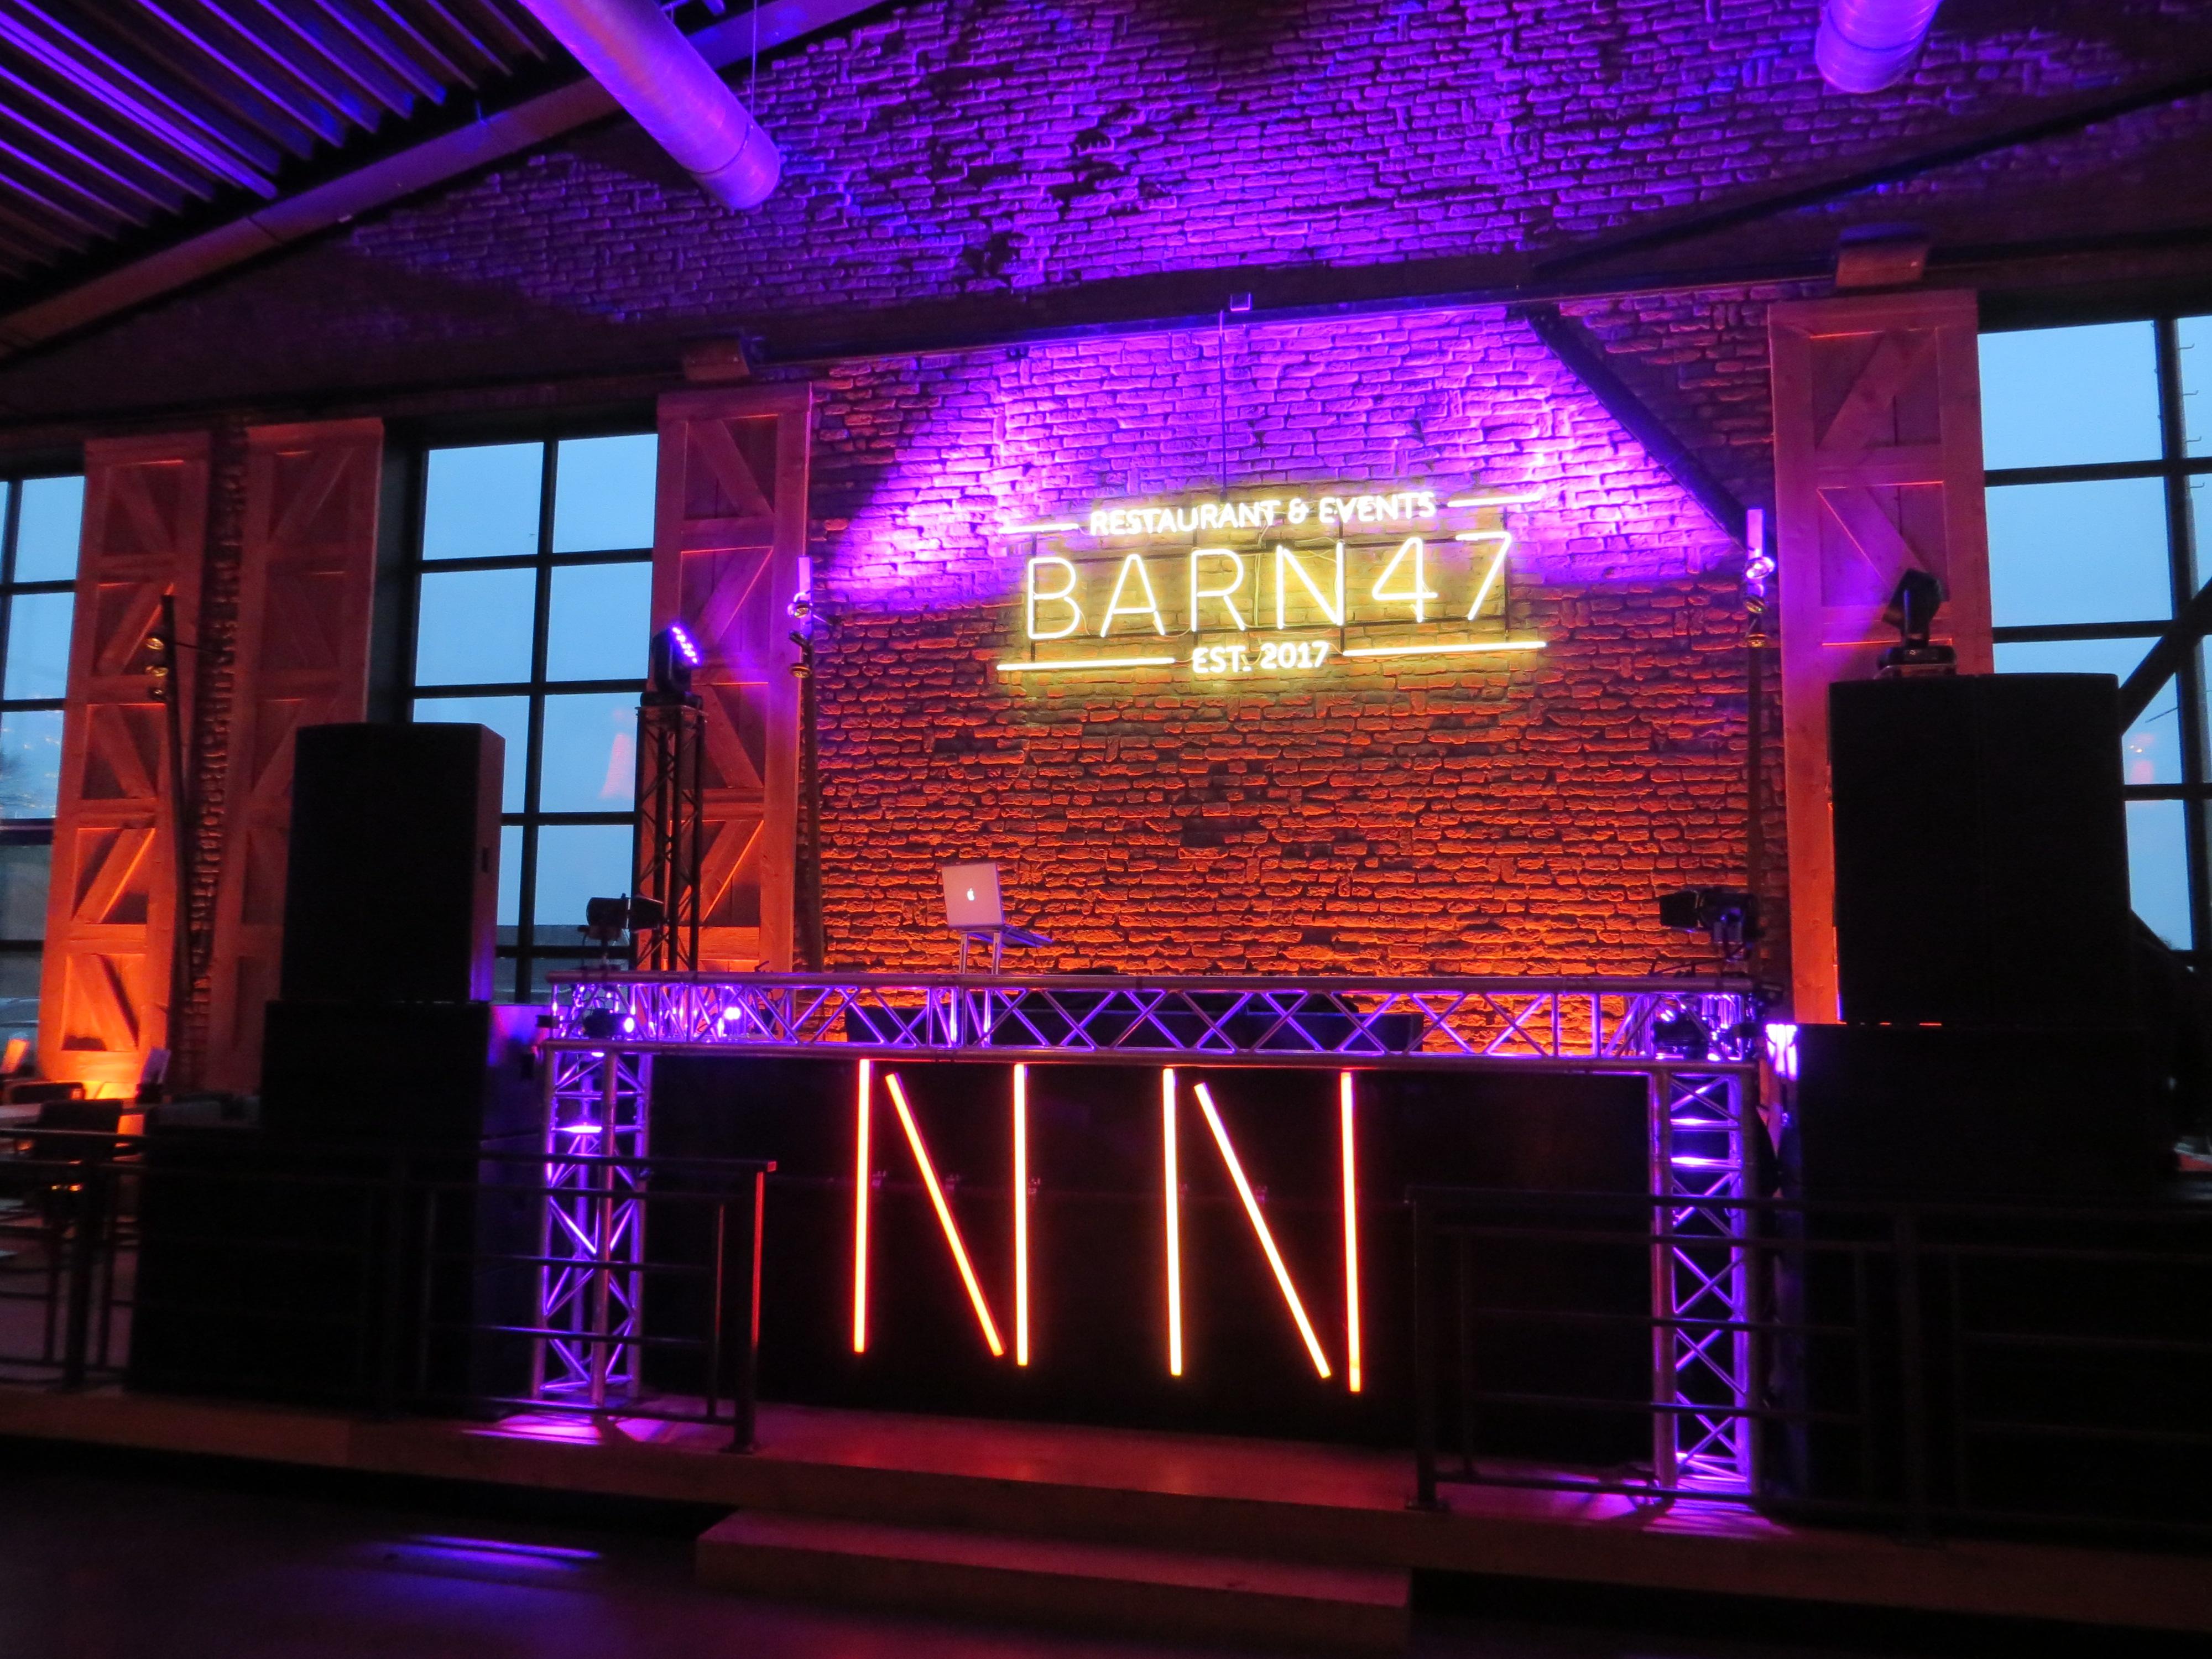 DJ Barn47 Ed Groven Bedrijfsfeest